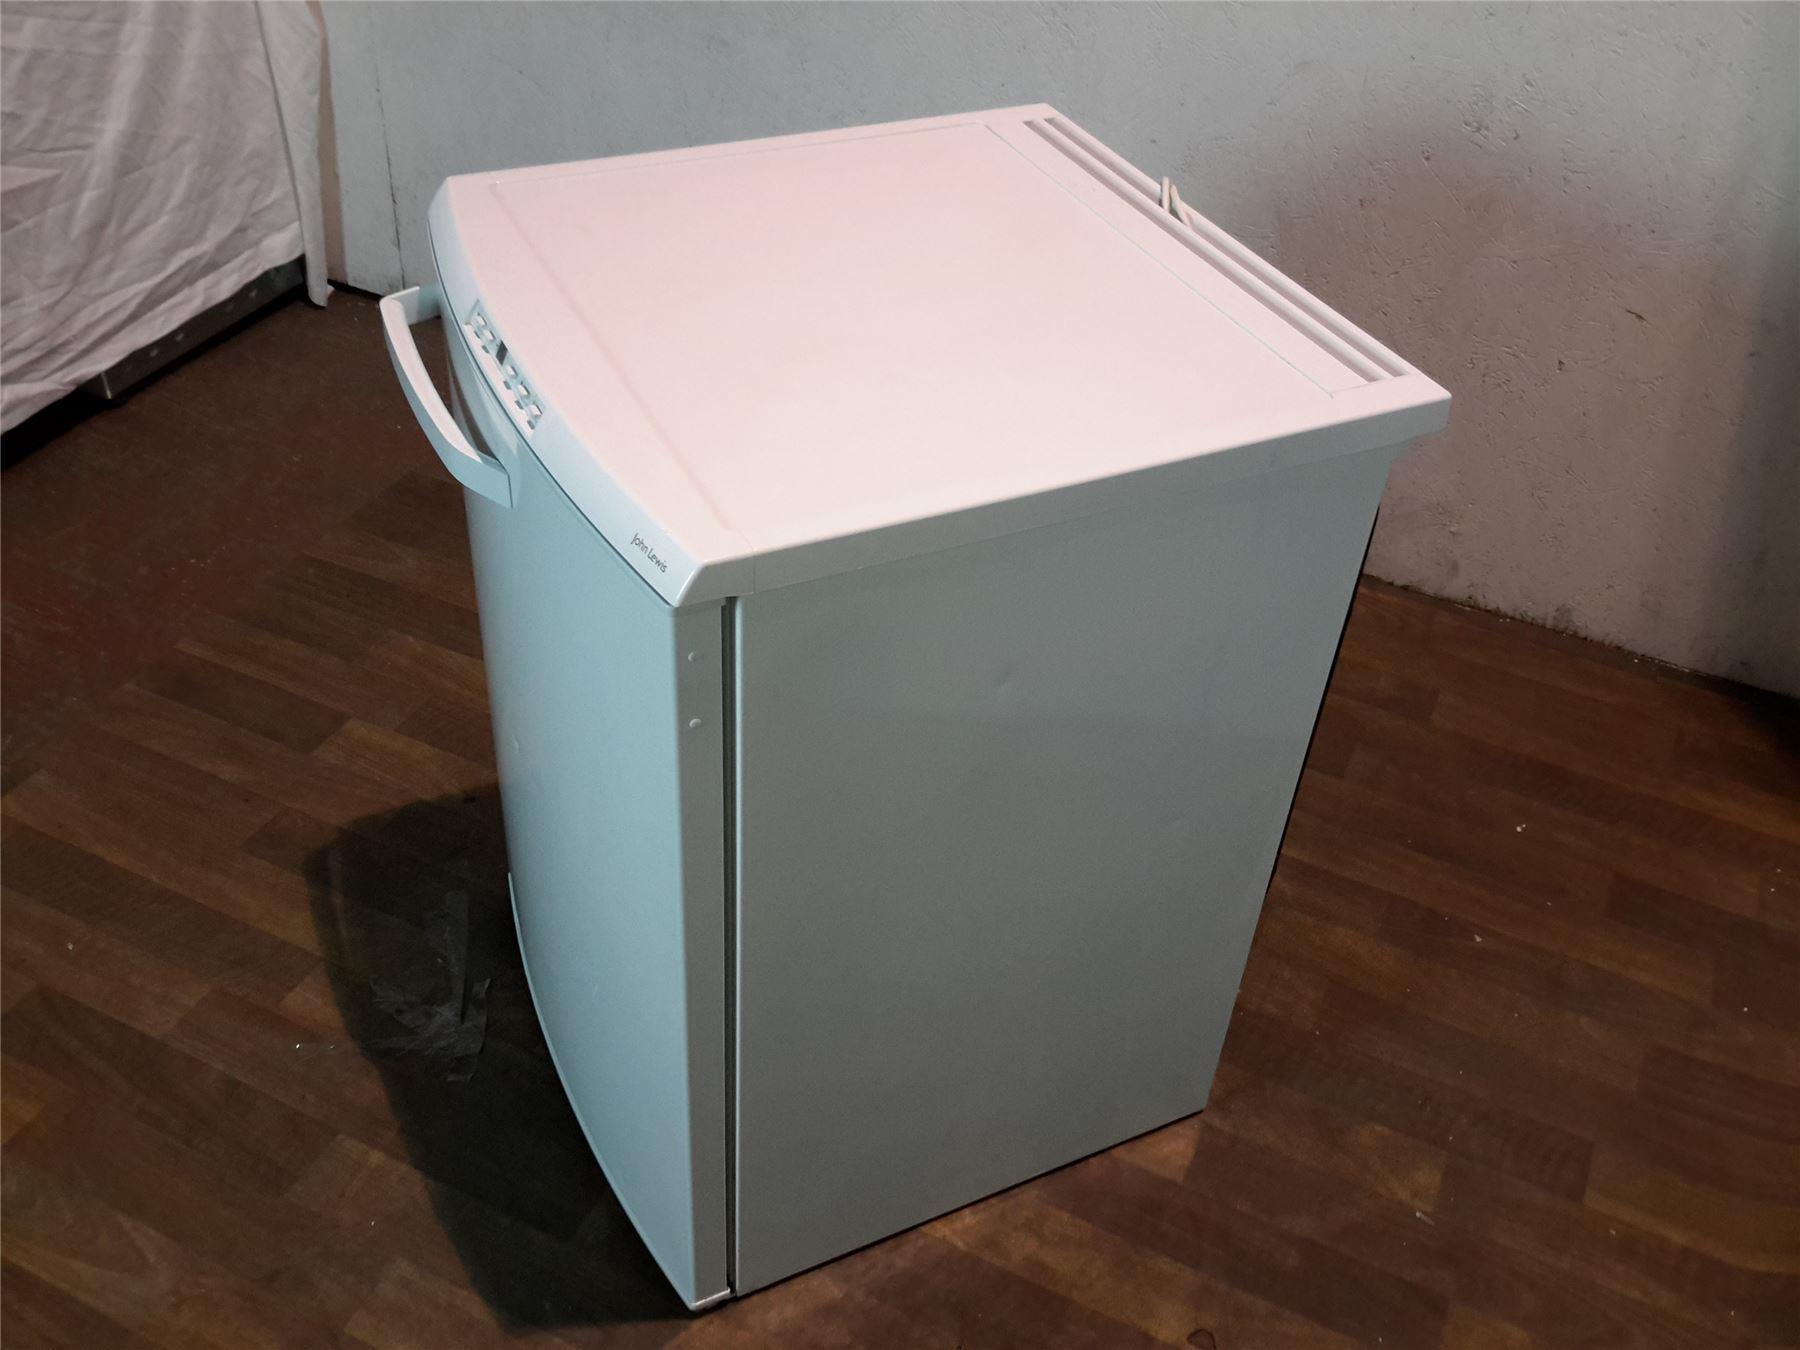 John Lewis Jlw6010 Frost Free Freezer A Undercounter